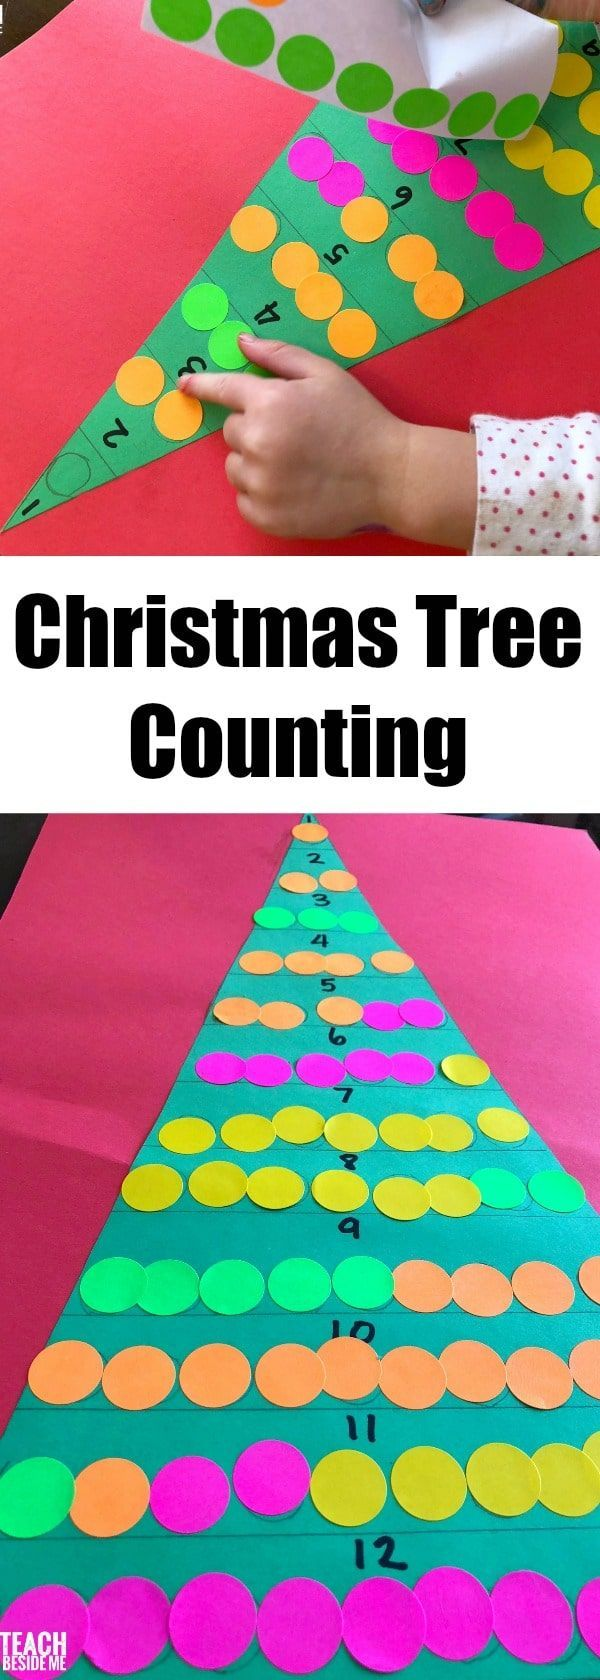 Christmas tree counting for preschool